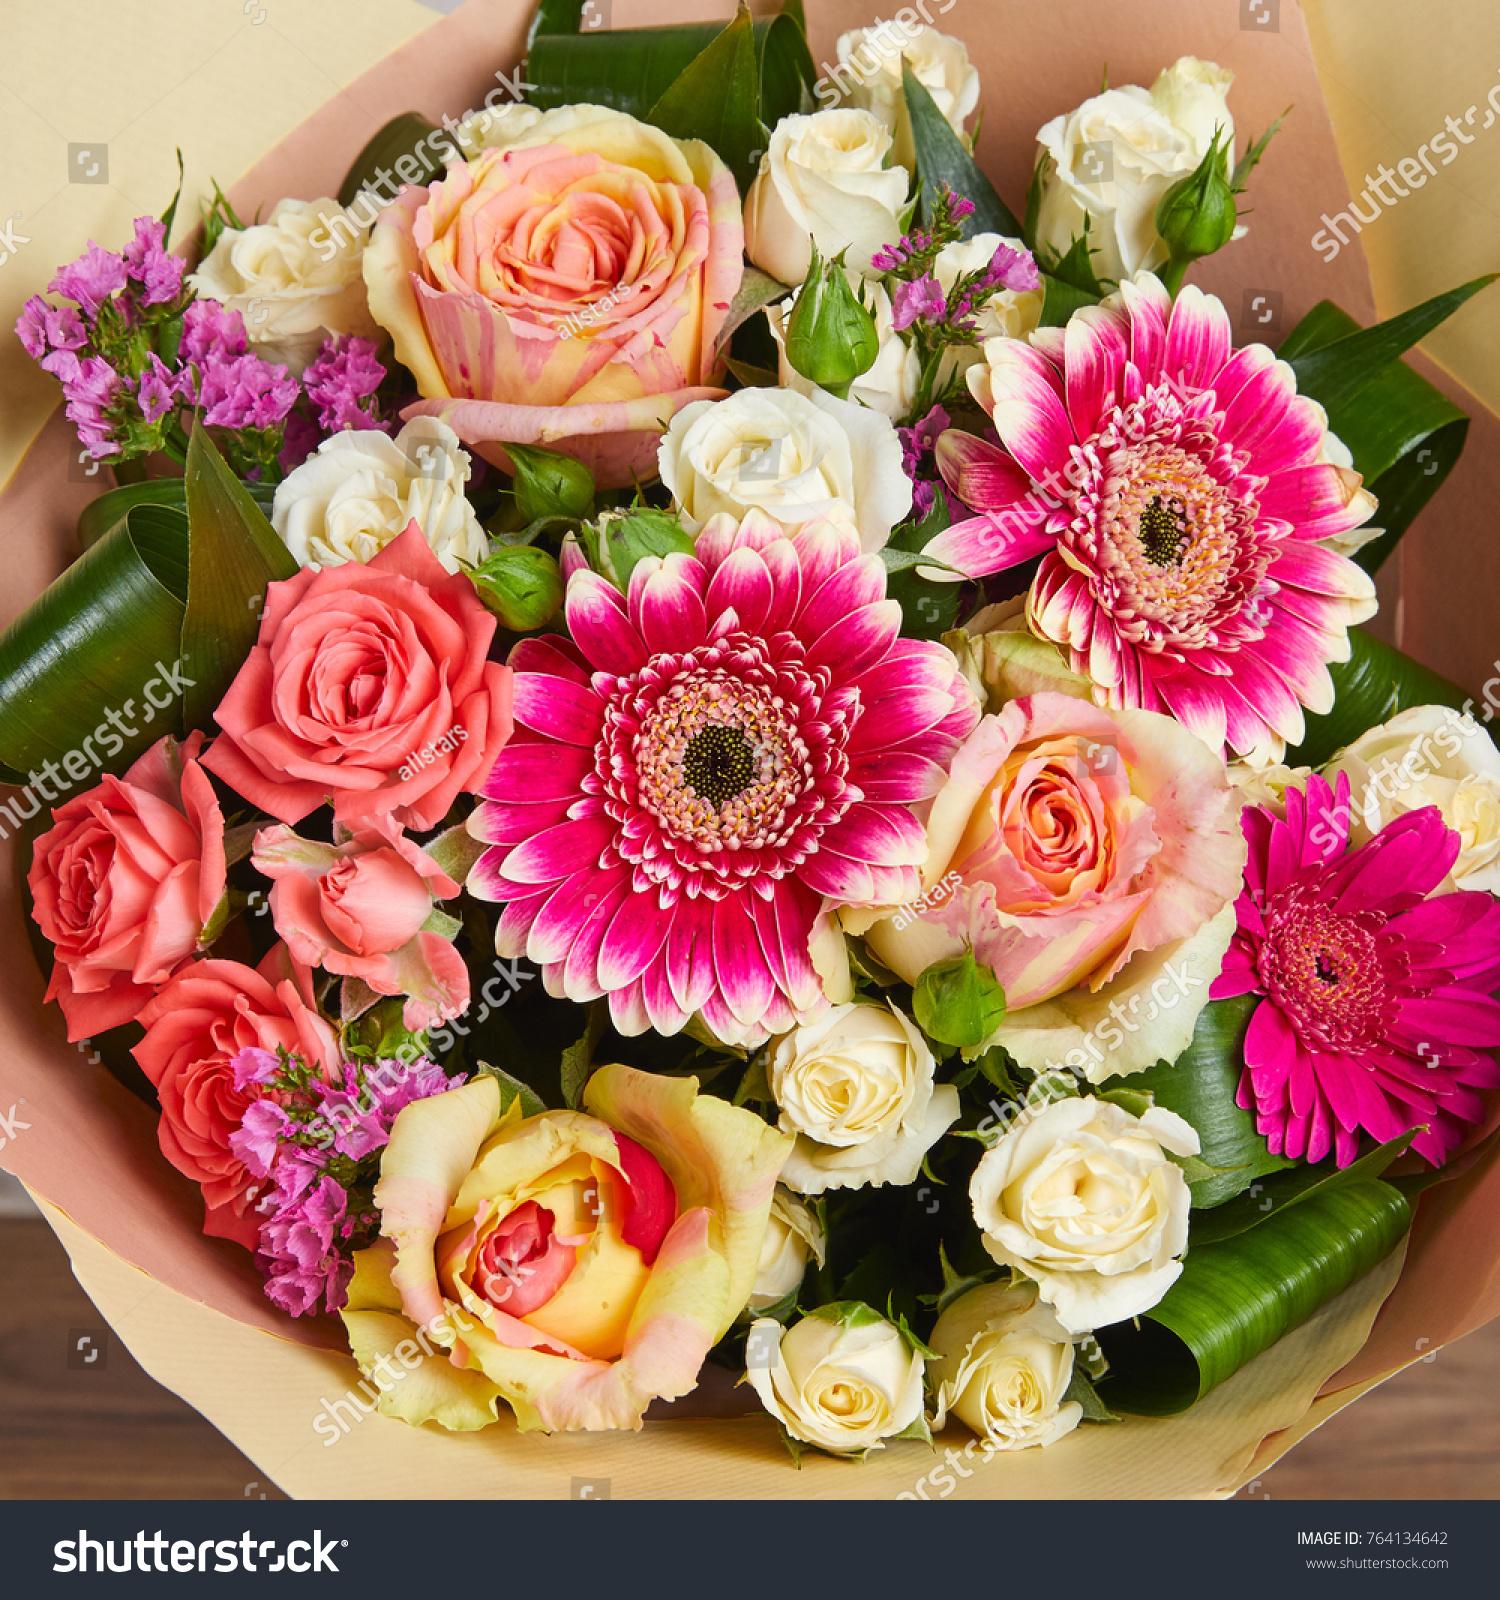 Nice Flower Bouquet Stock Photo Edit Now 764134642 Shutterstock